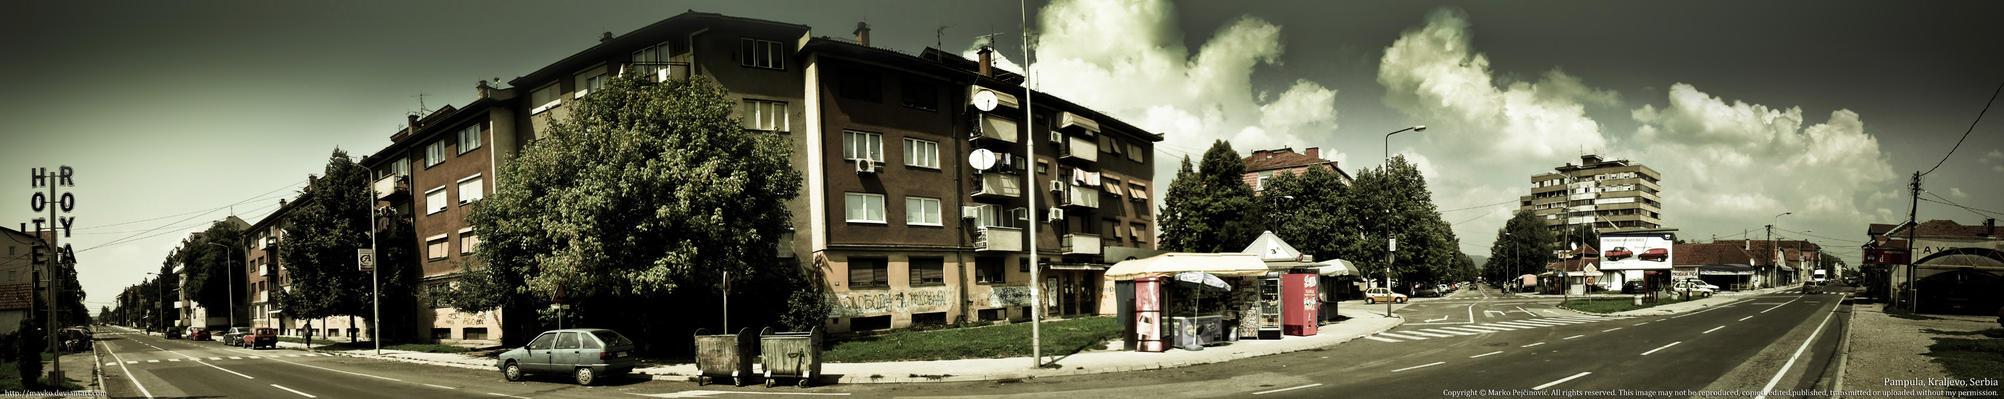 Kraljevo Pampula panorama by Mavko